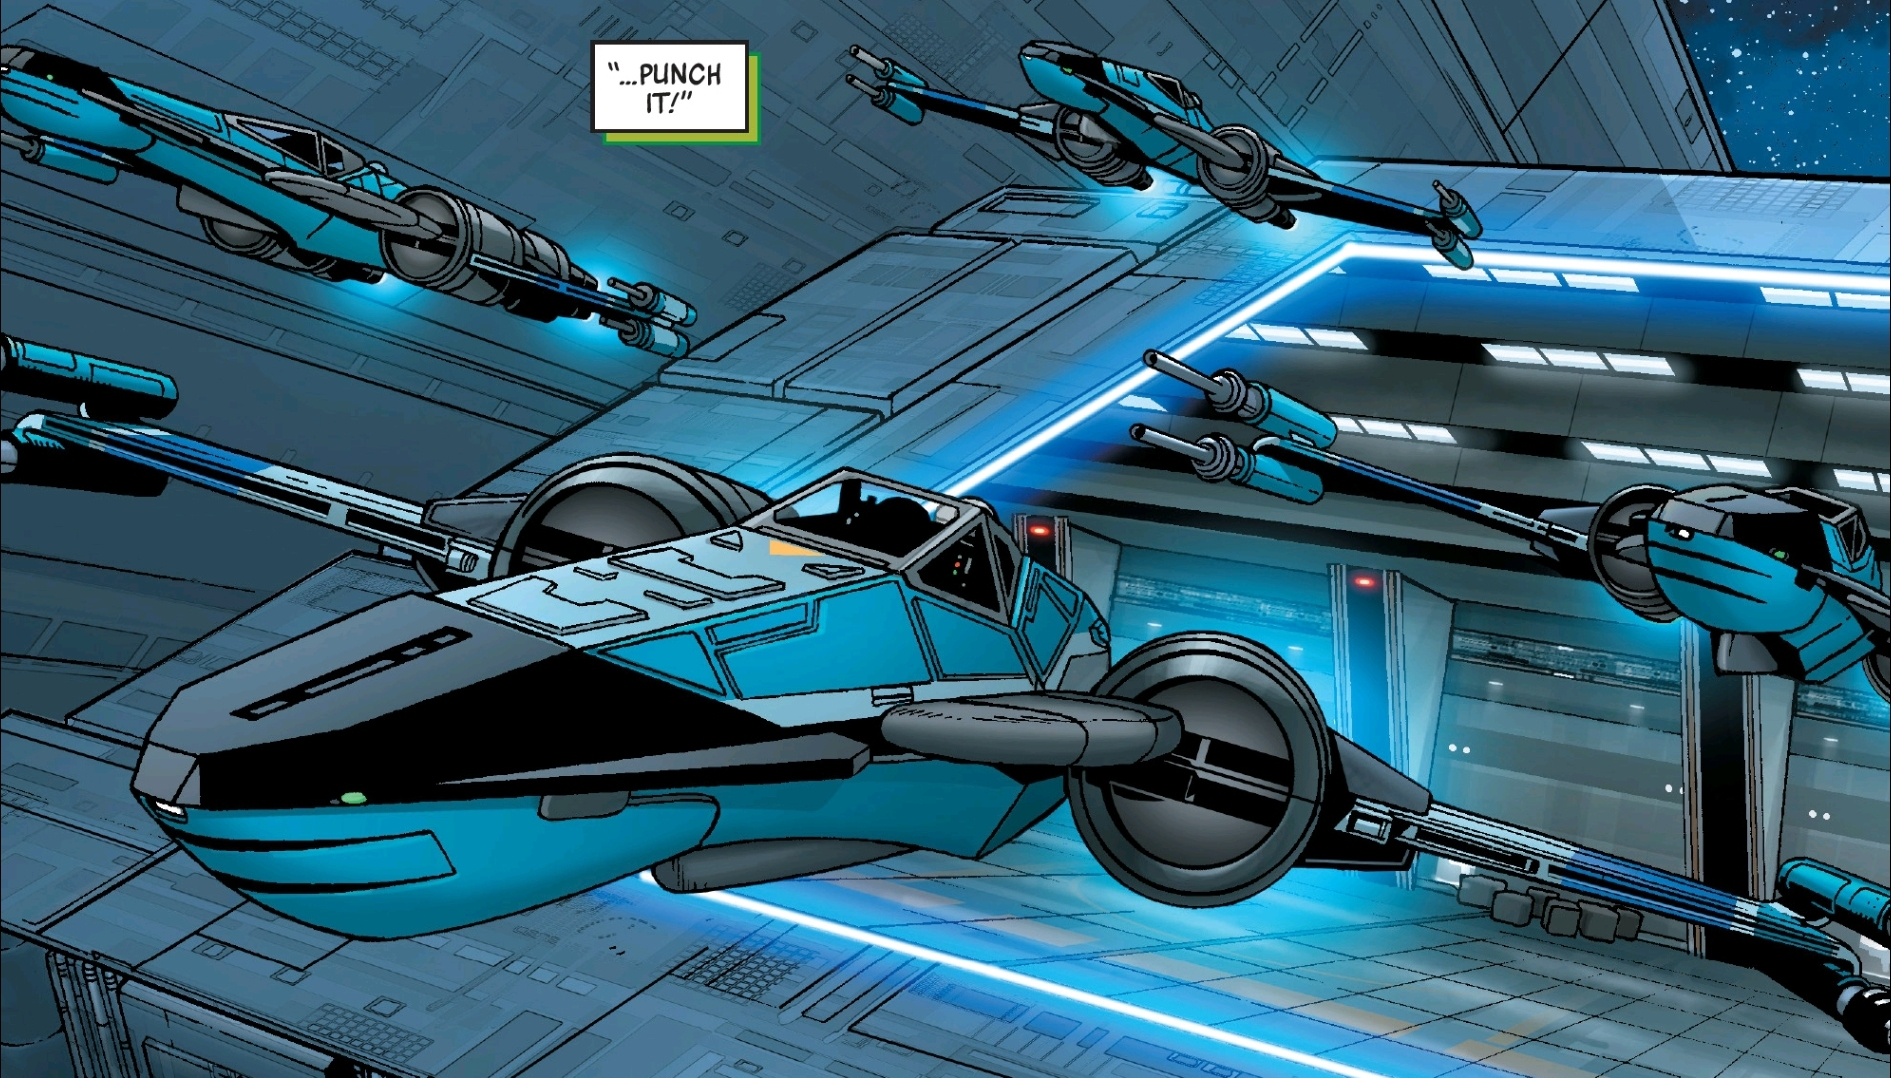 Screenshot_20200526-002710_Marvel Comics.jpg